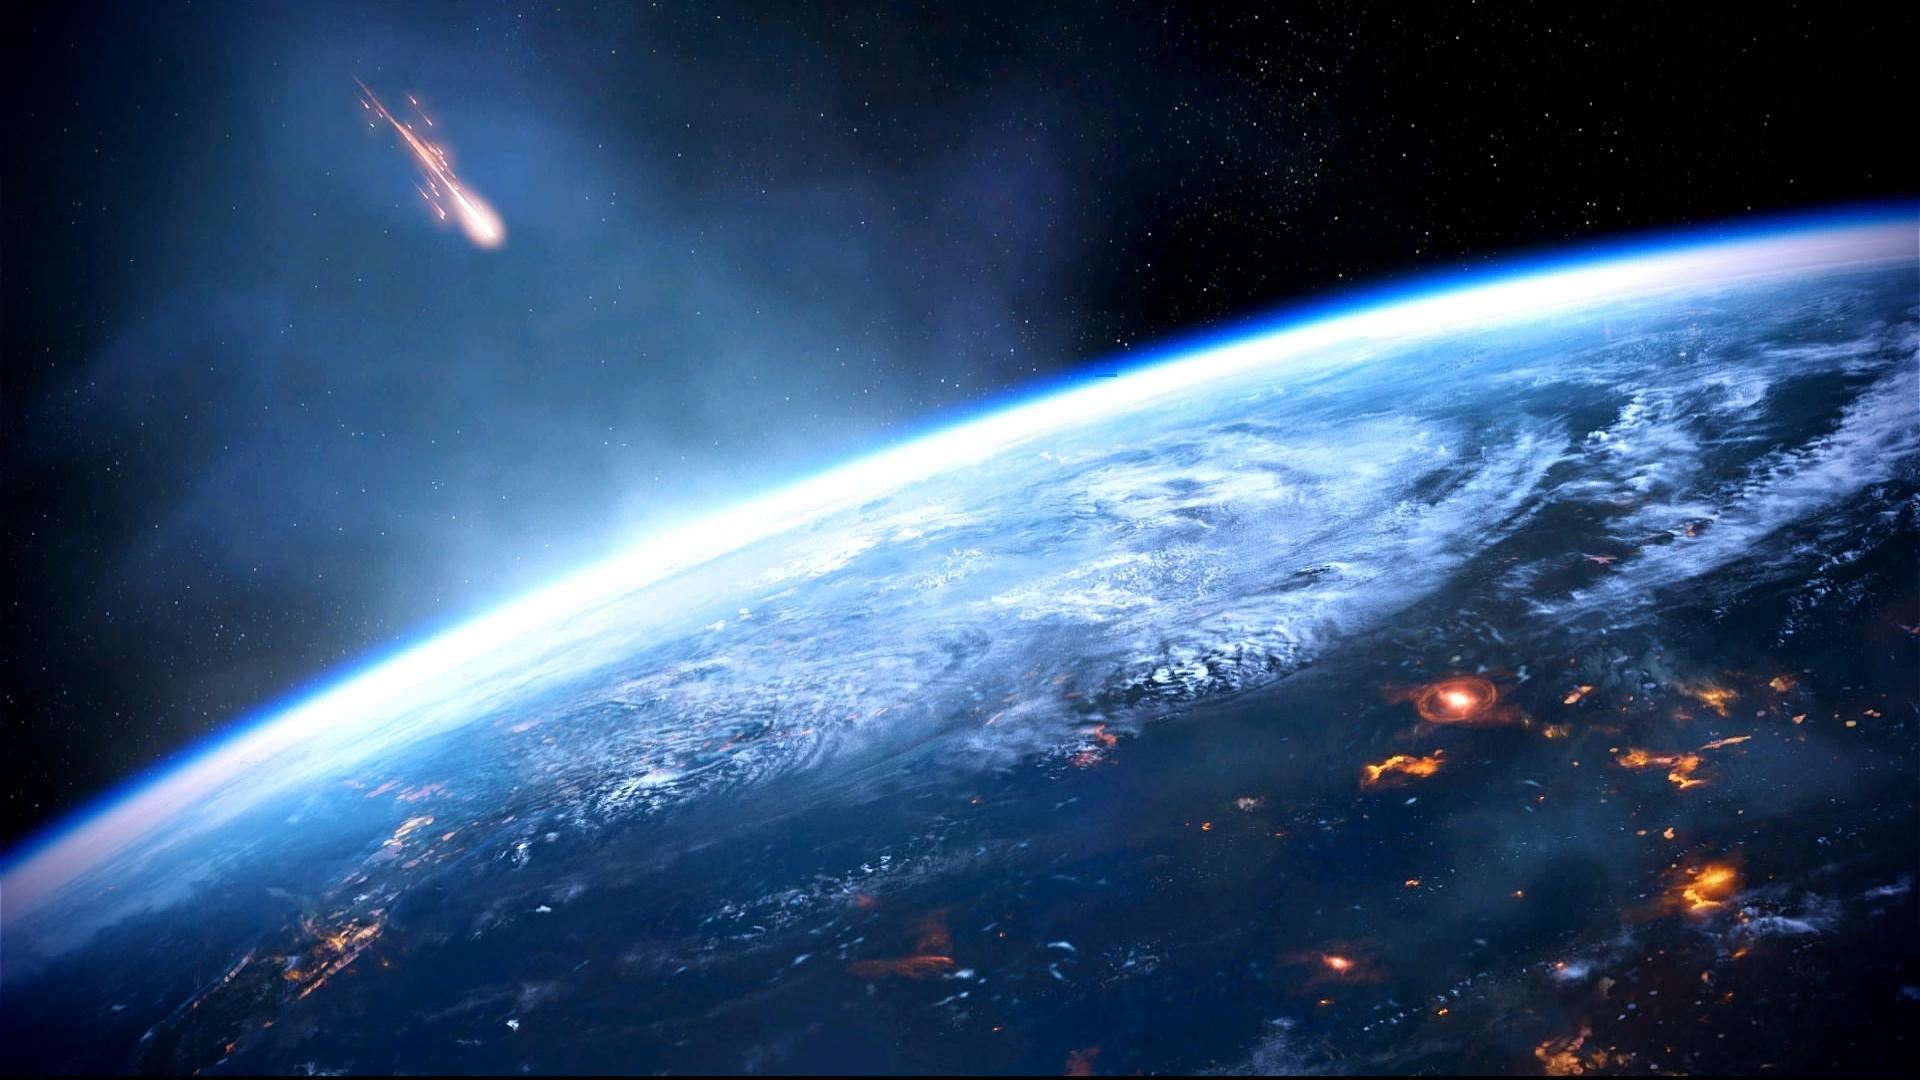 ... Mass Effect 3 Earth Dreamscene by droot1986